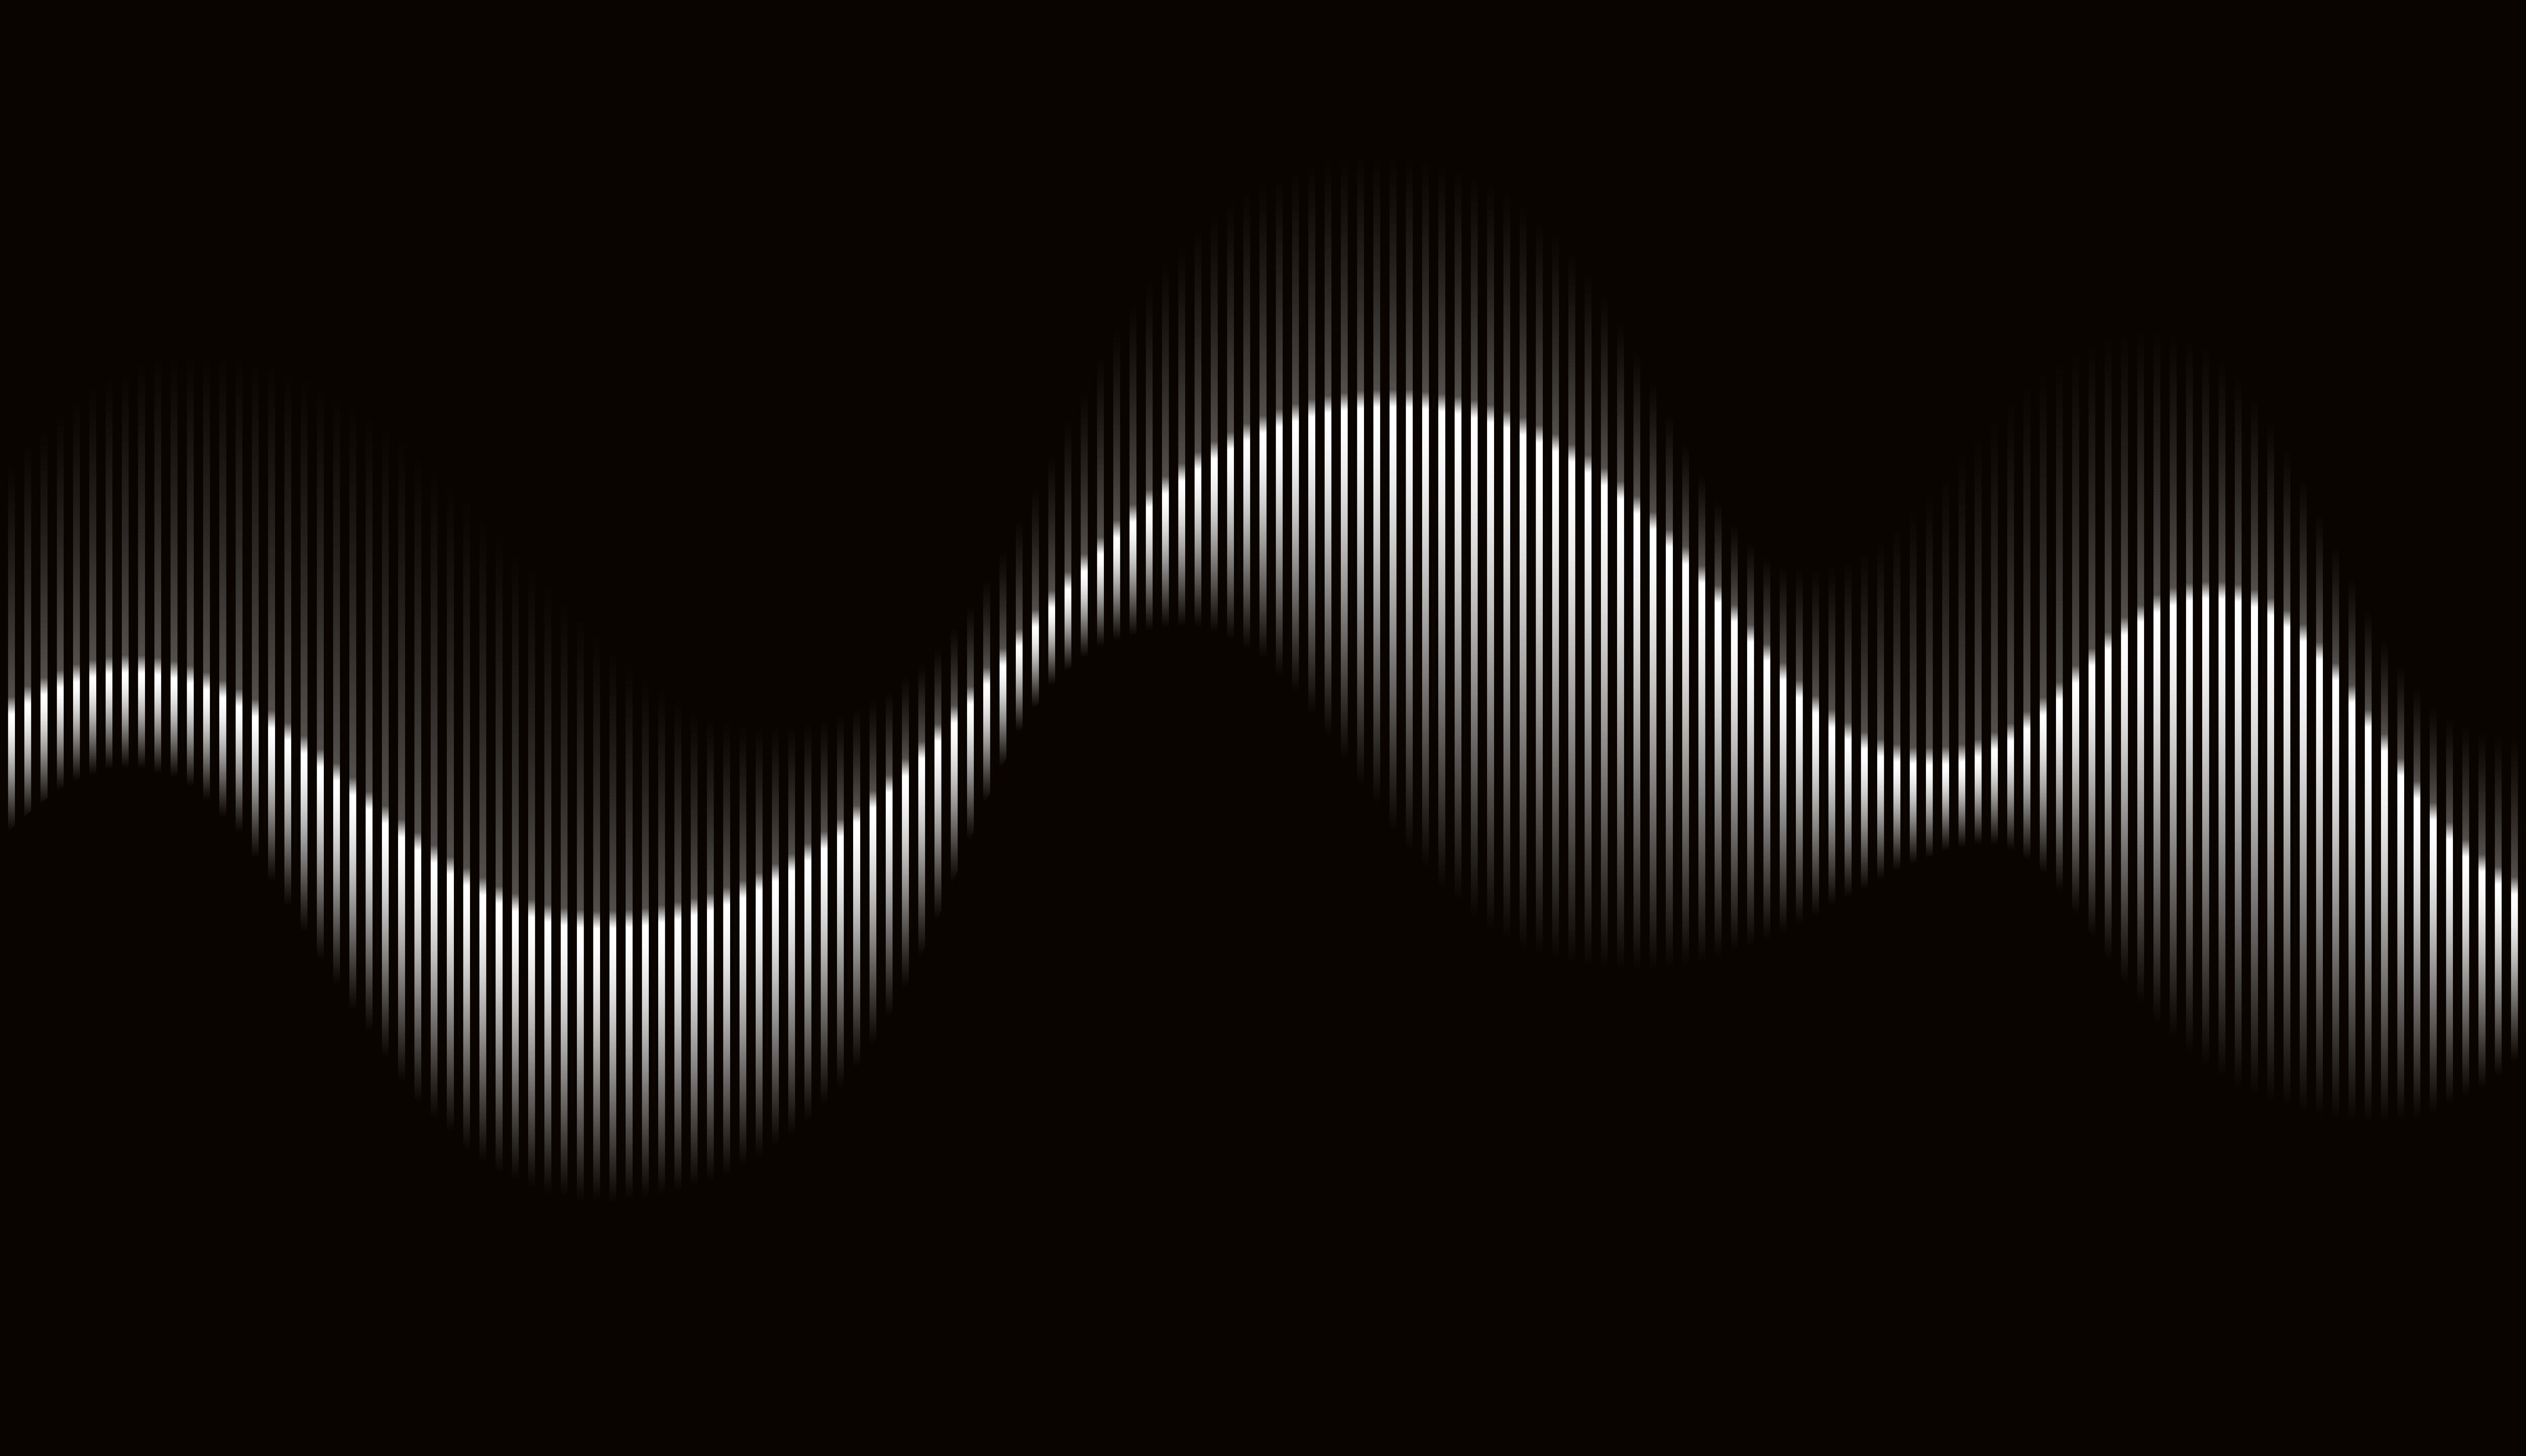 voice waves